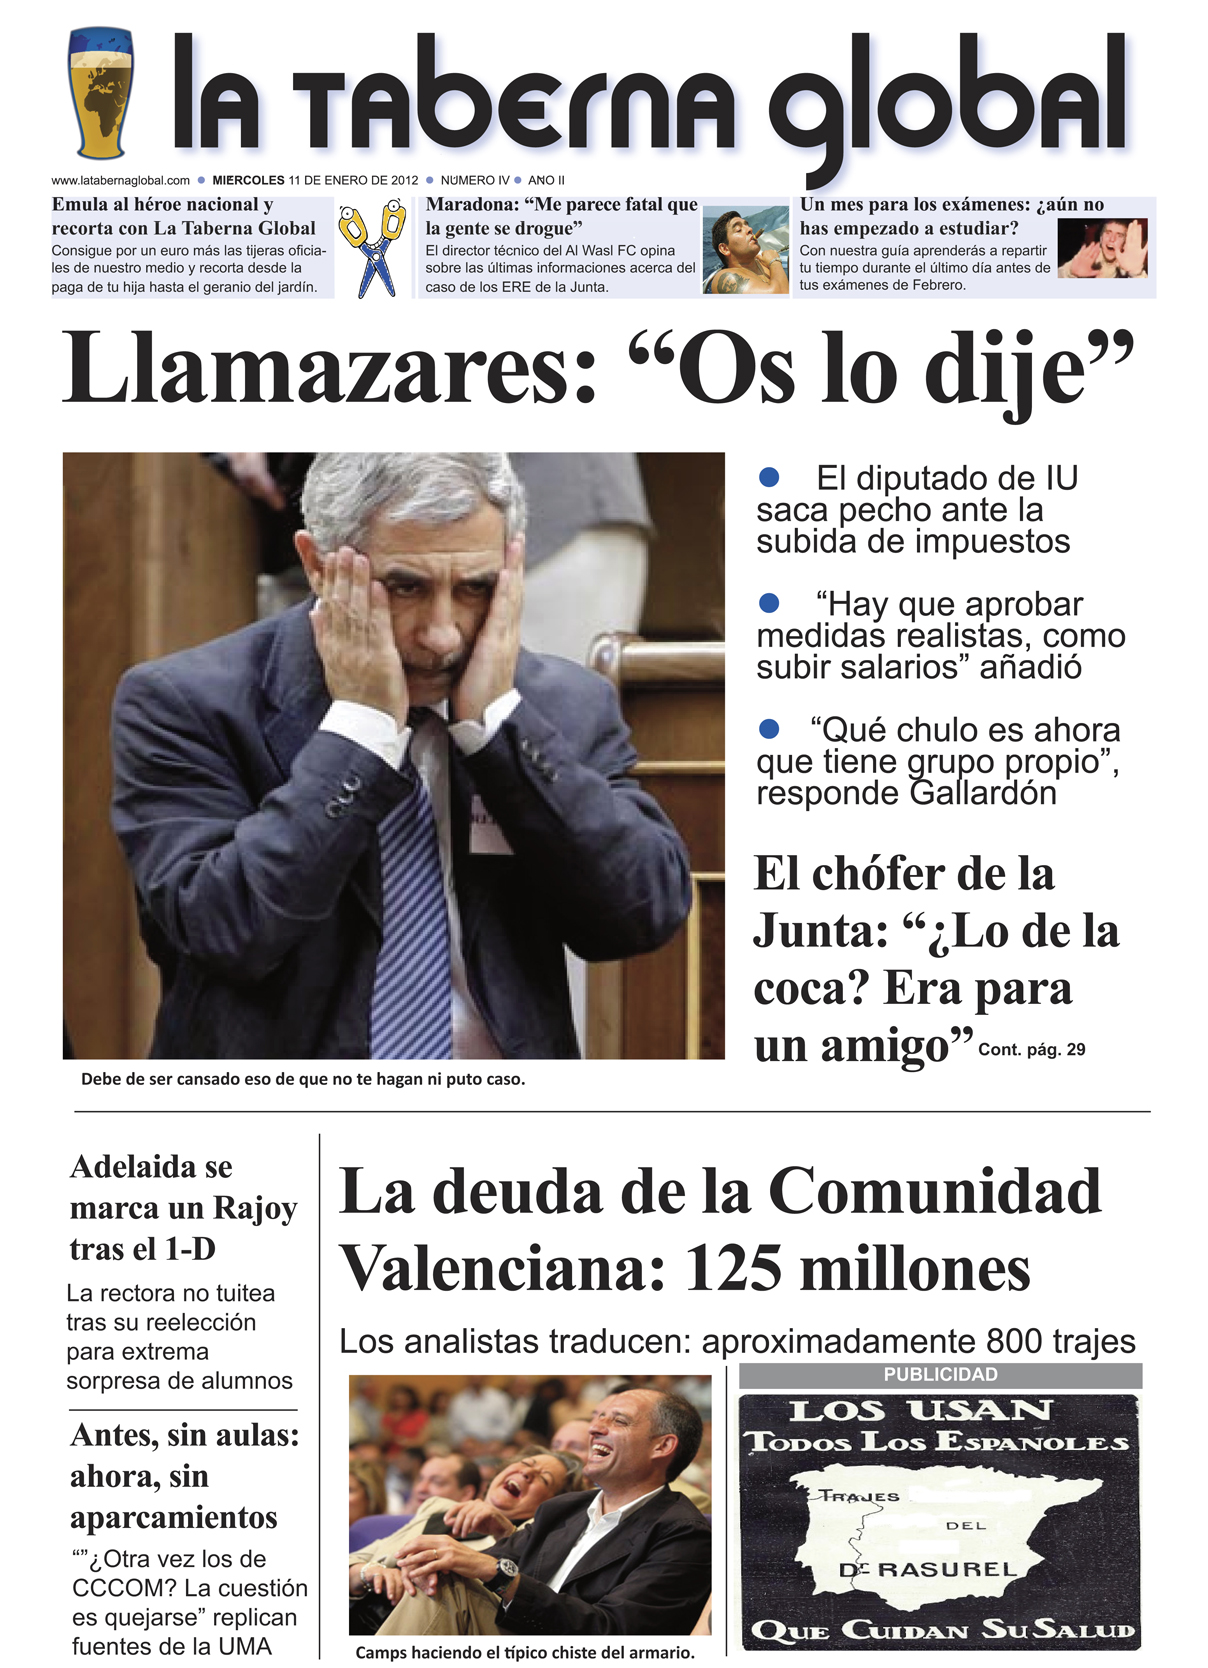 La portada satírica de LTG 11/01/12